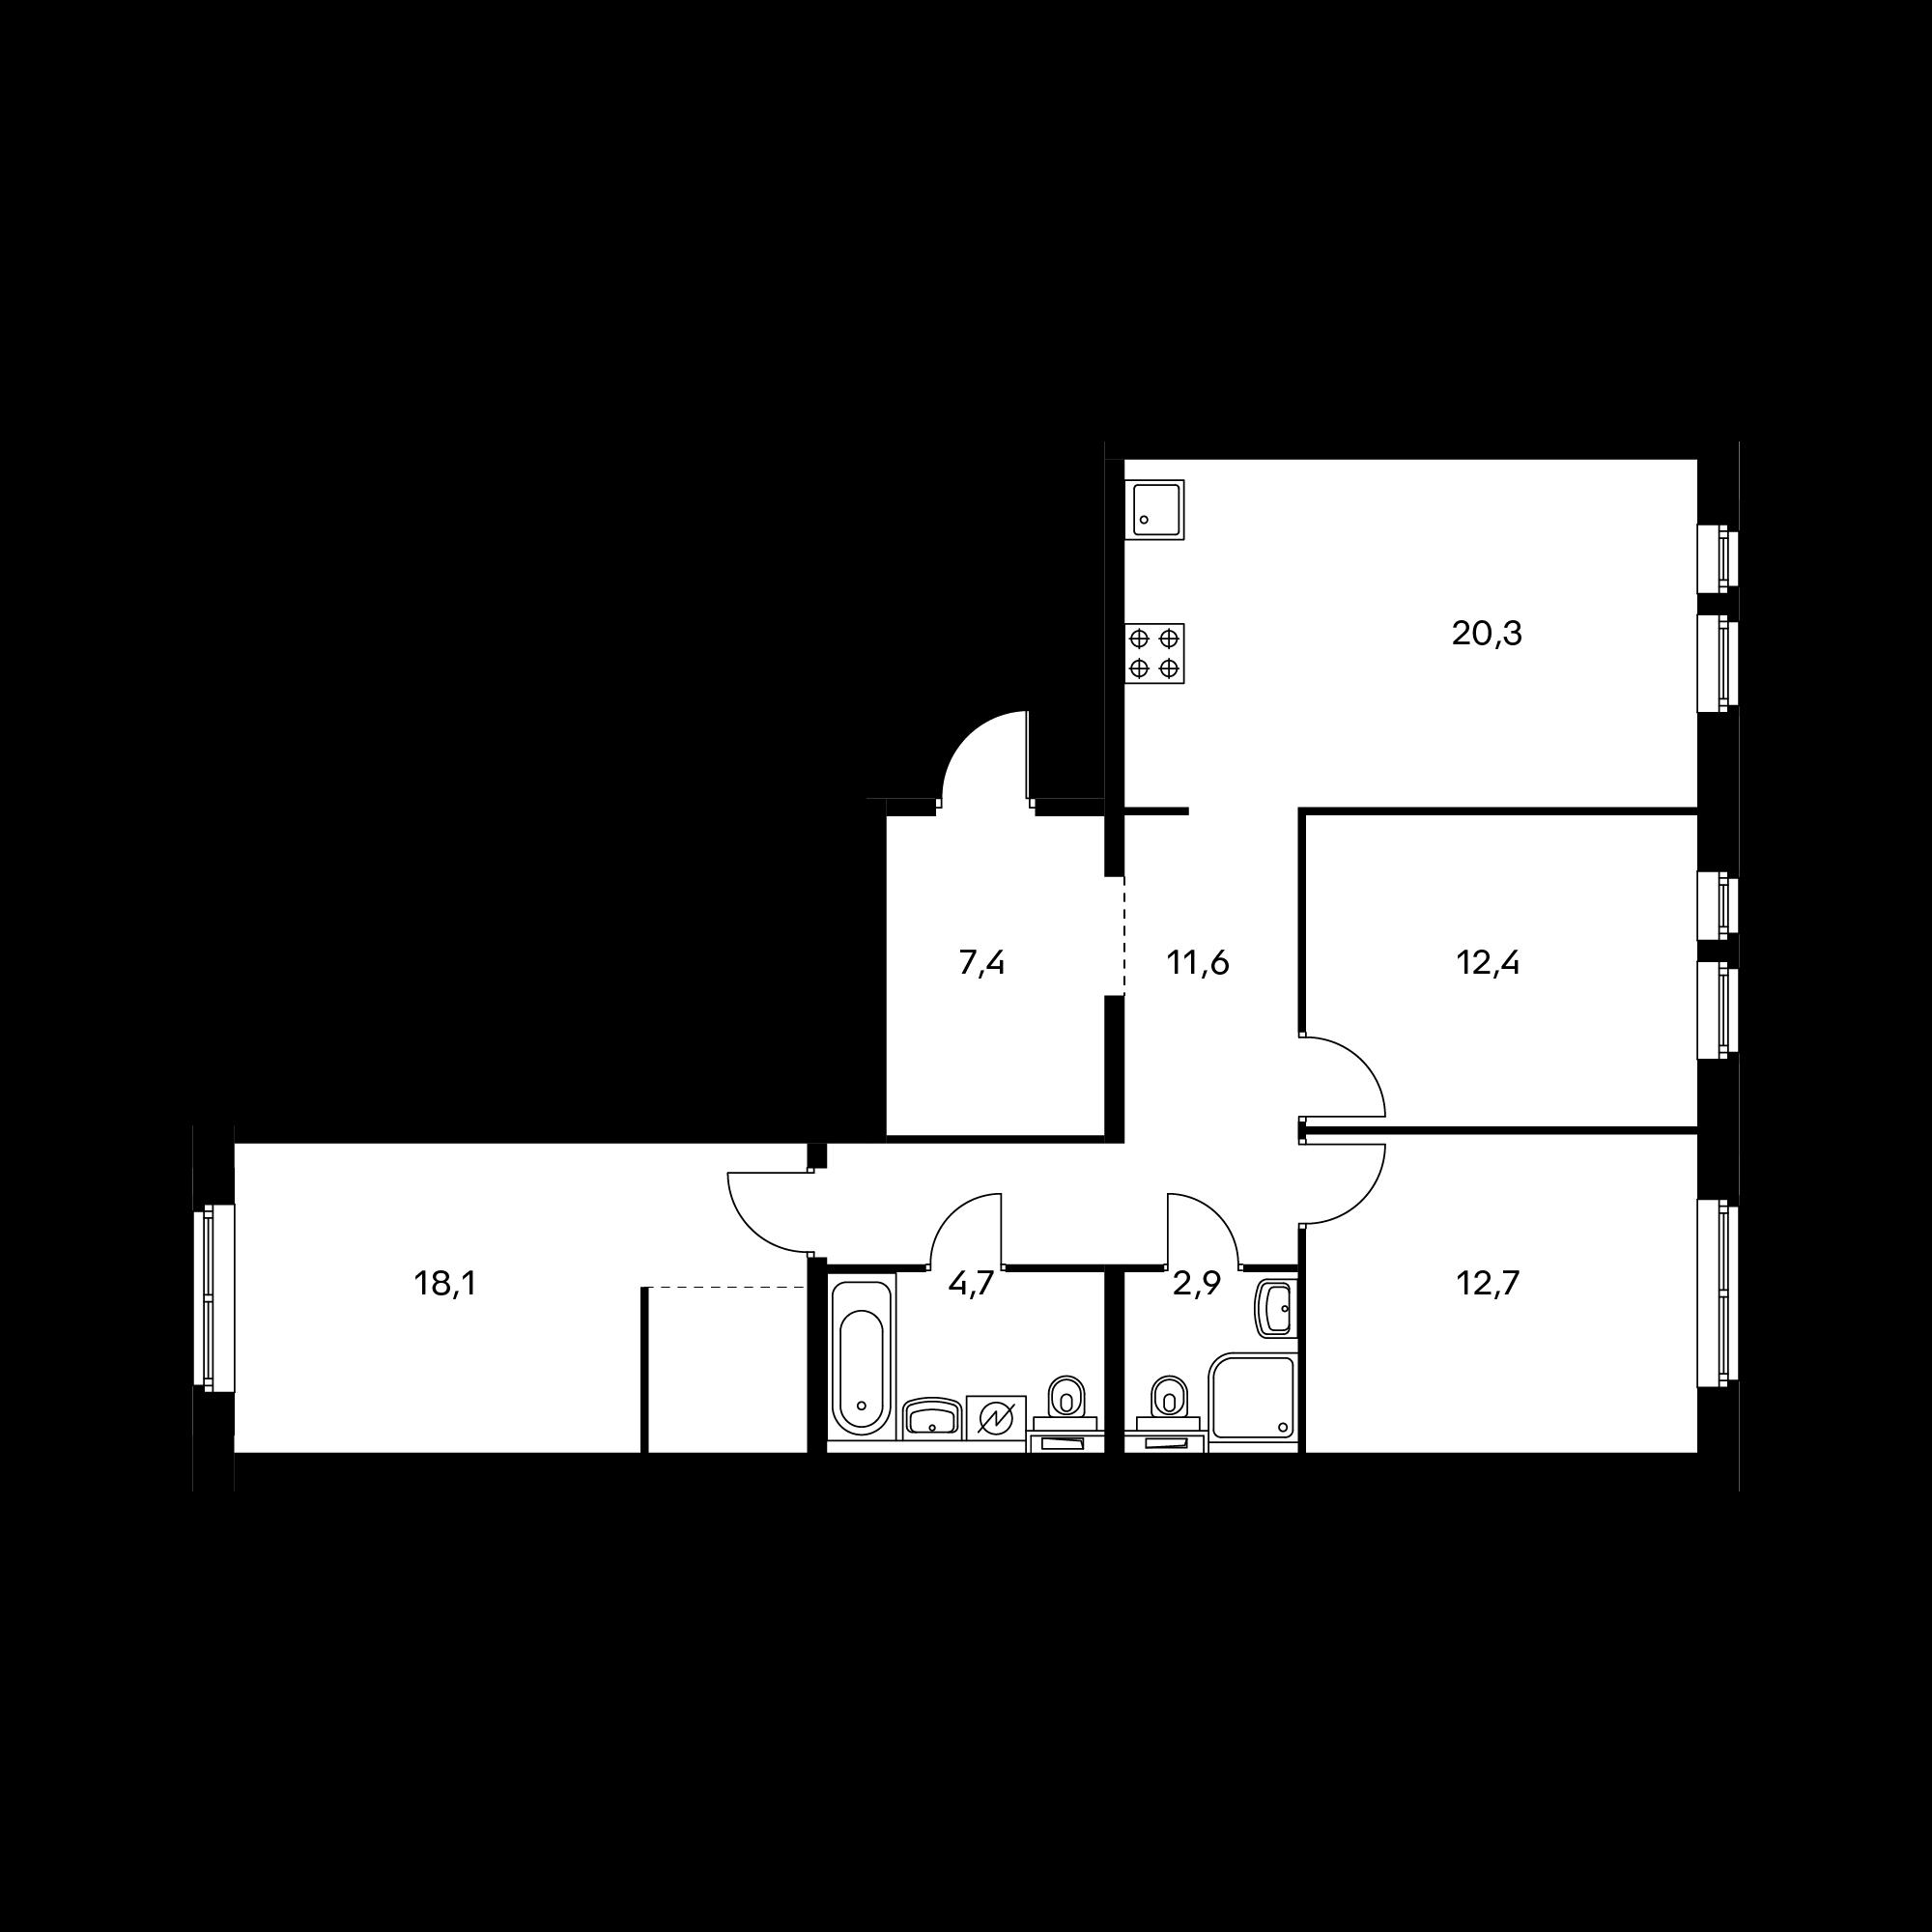 3EL3_10.2-4